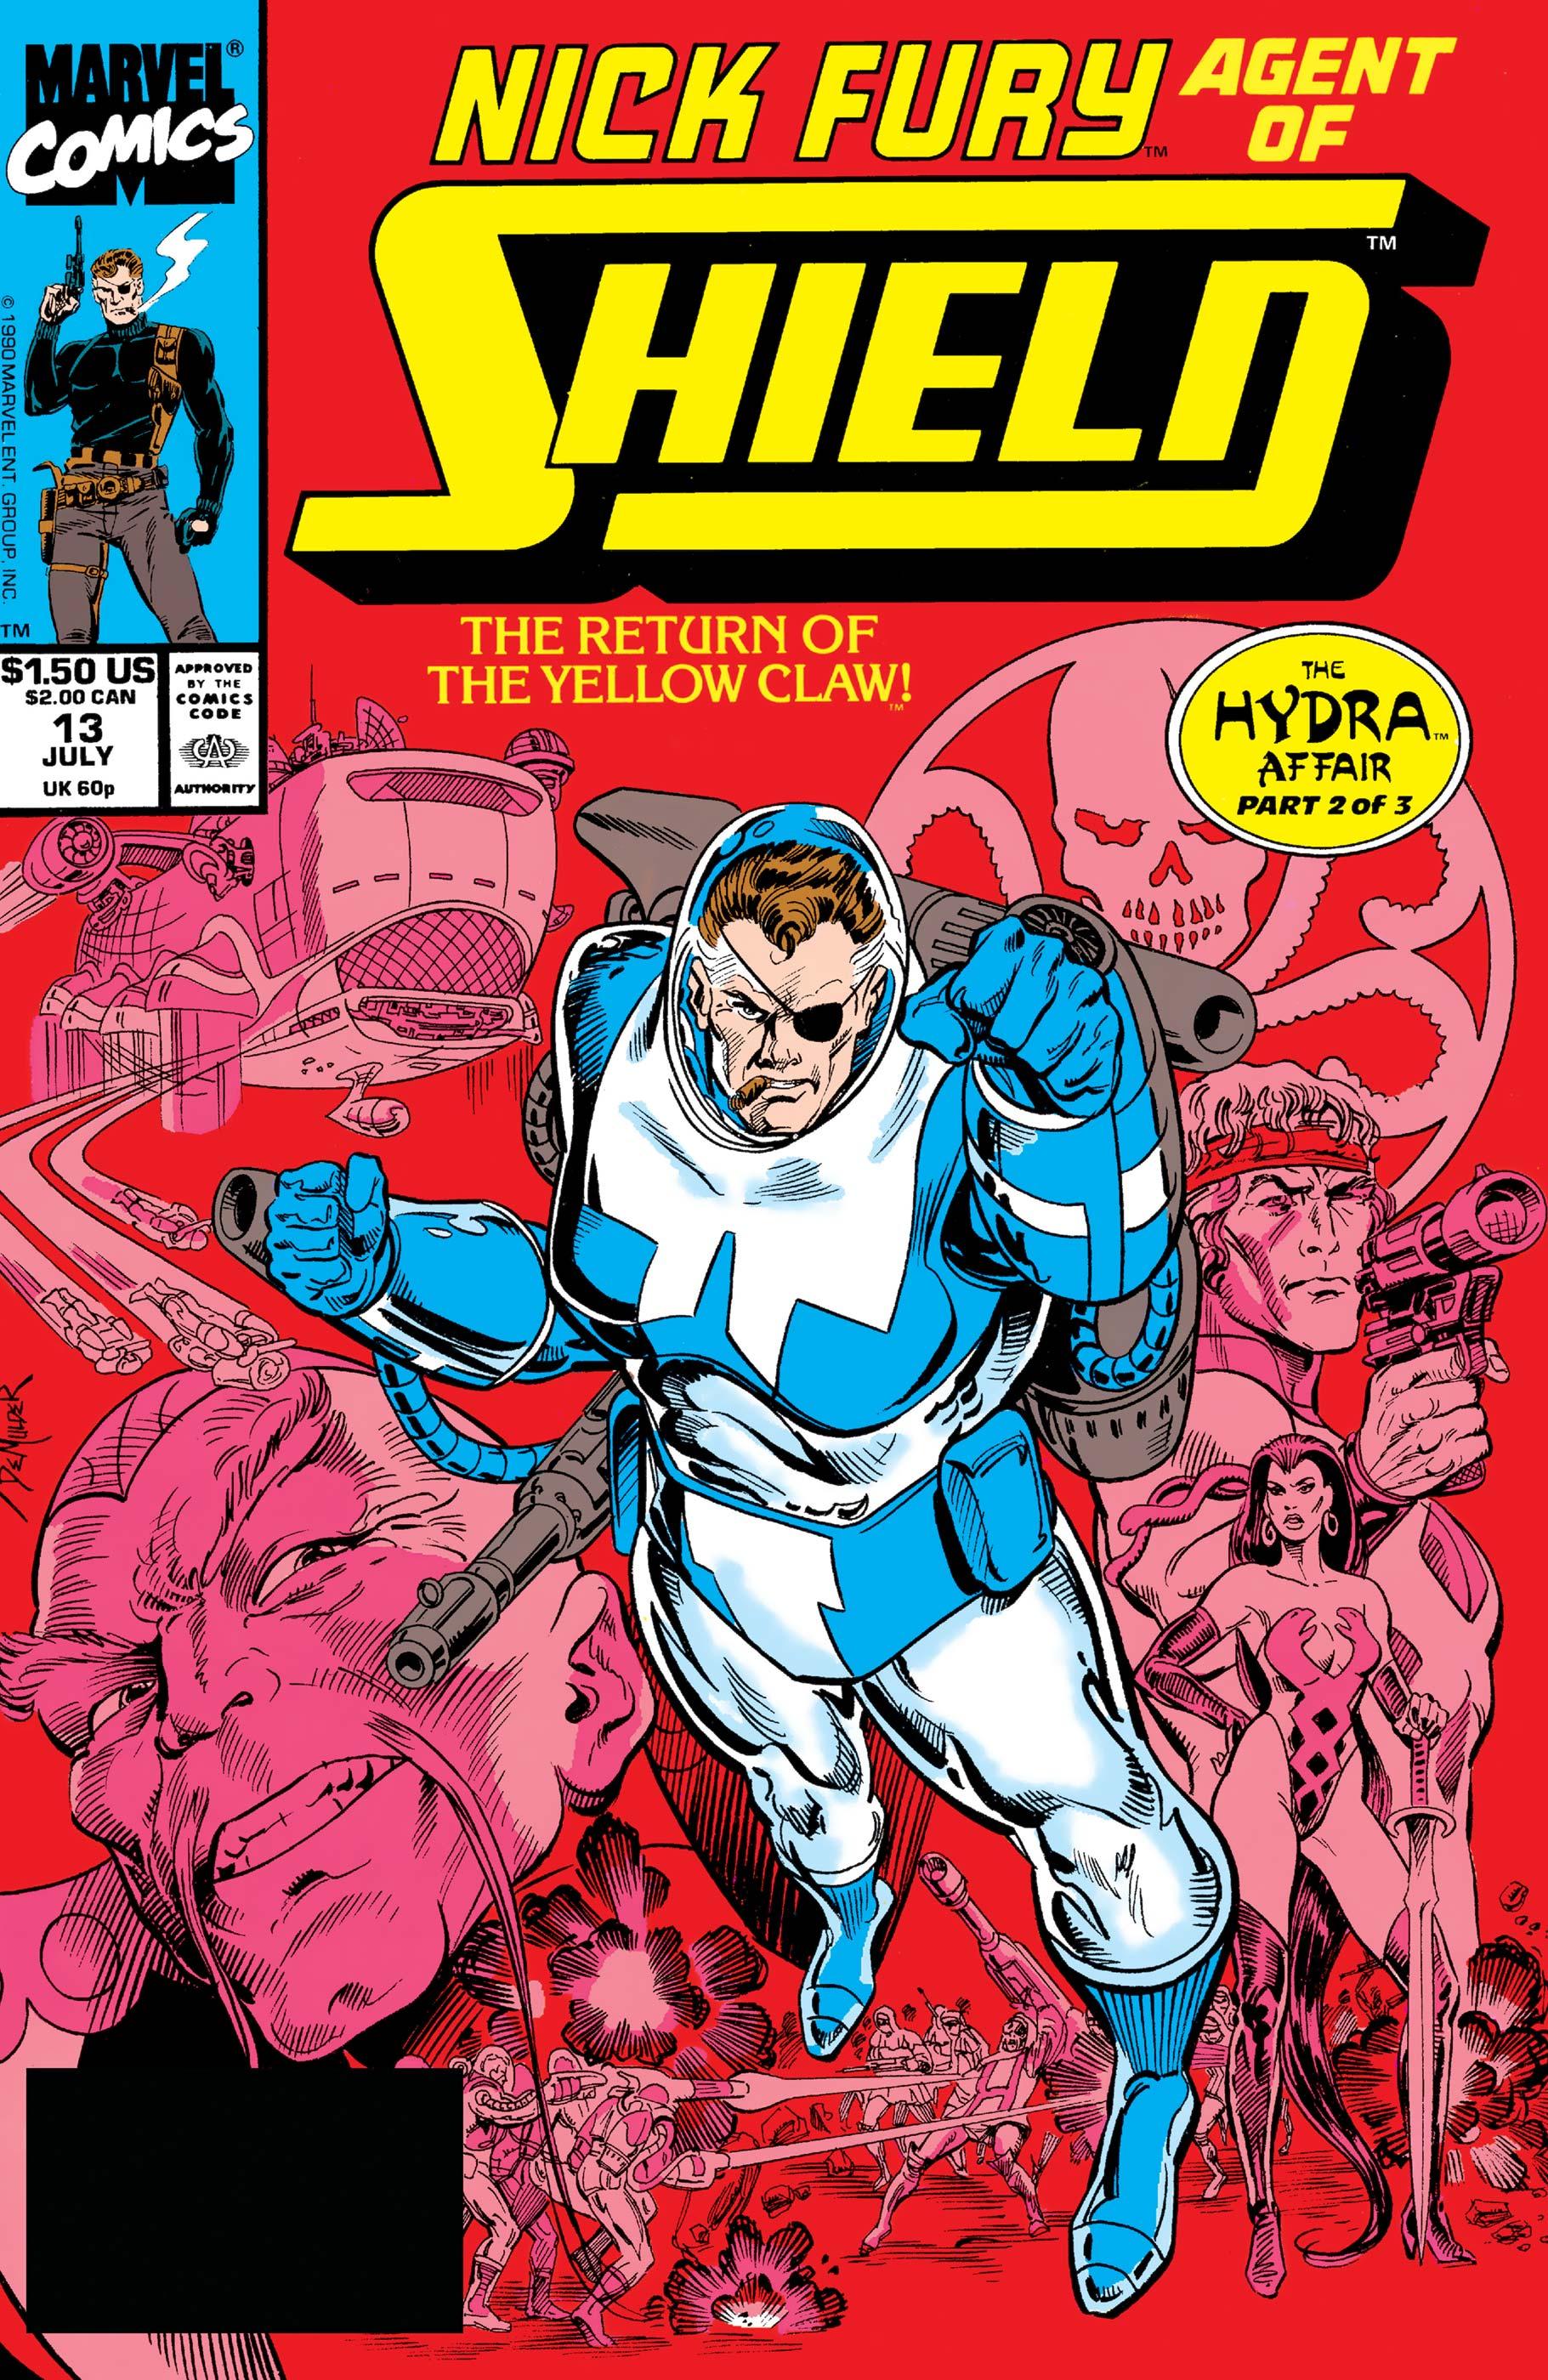 Nick Fury, Agent of S.H.I.E.L.D. (1989) #13